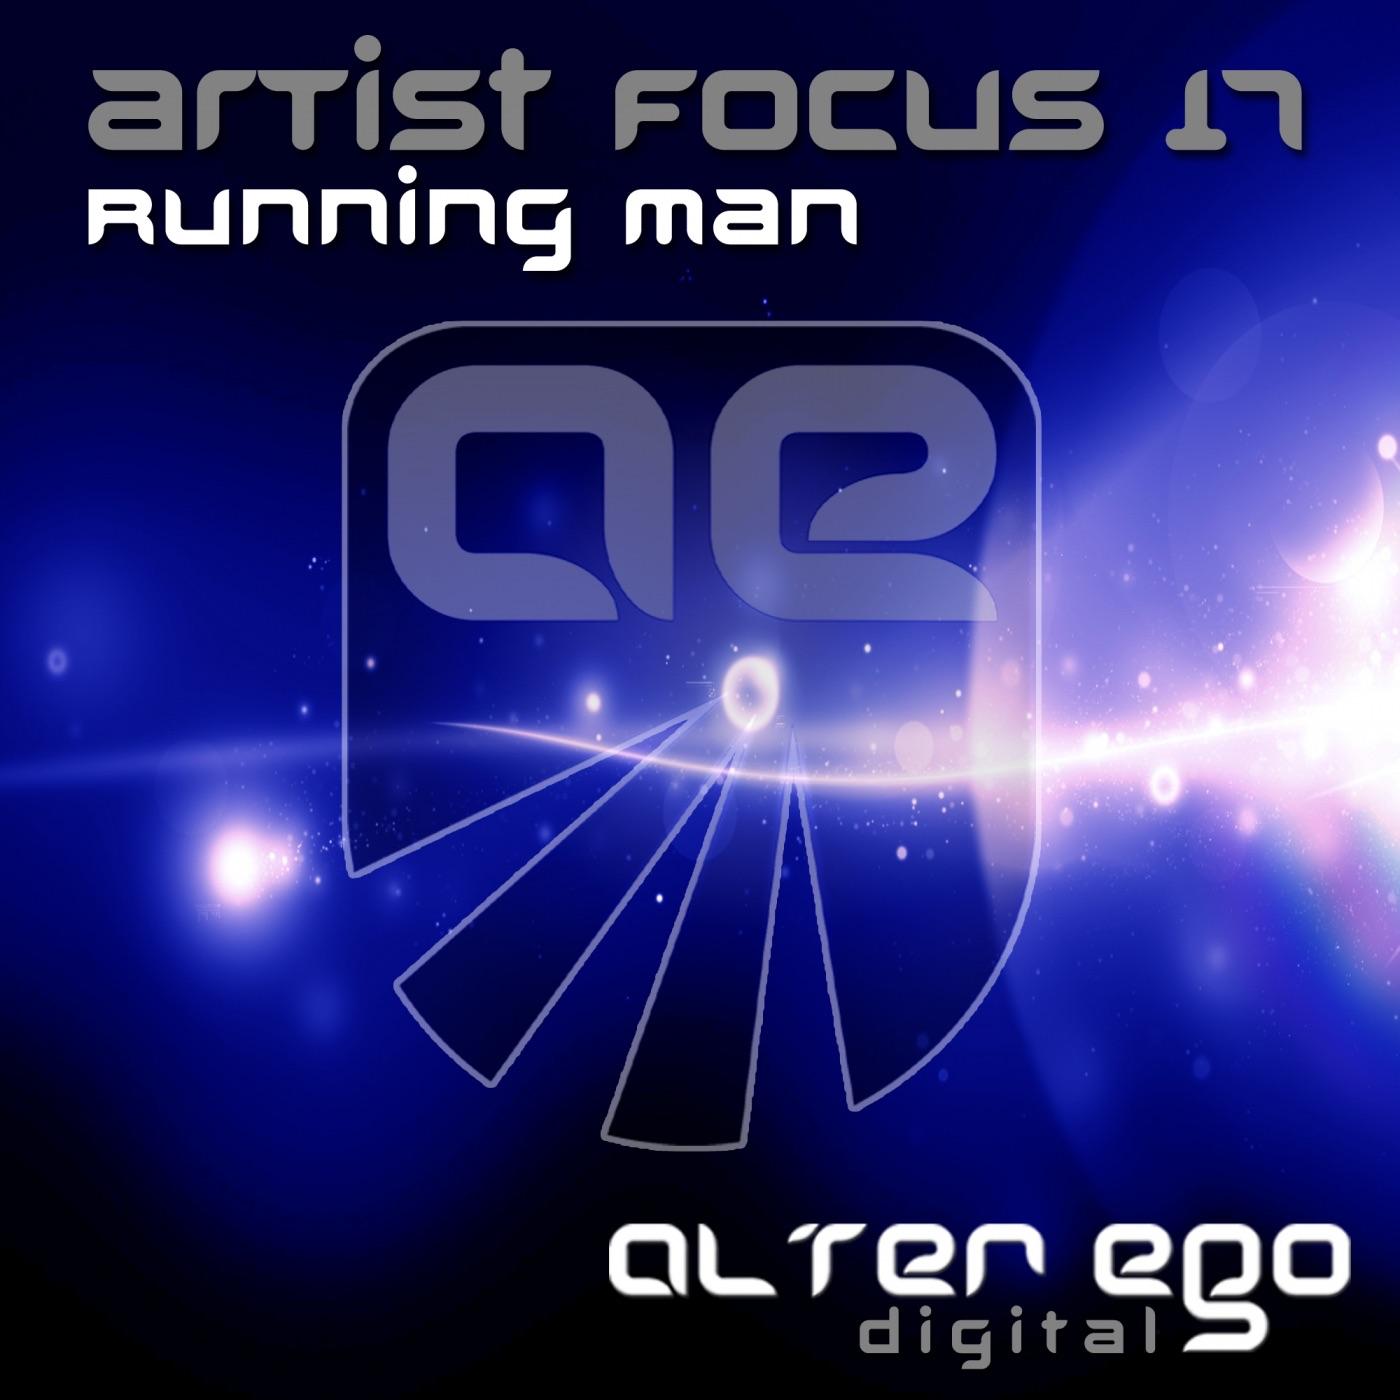 Artist Focus 17